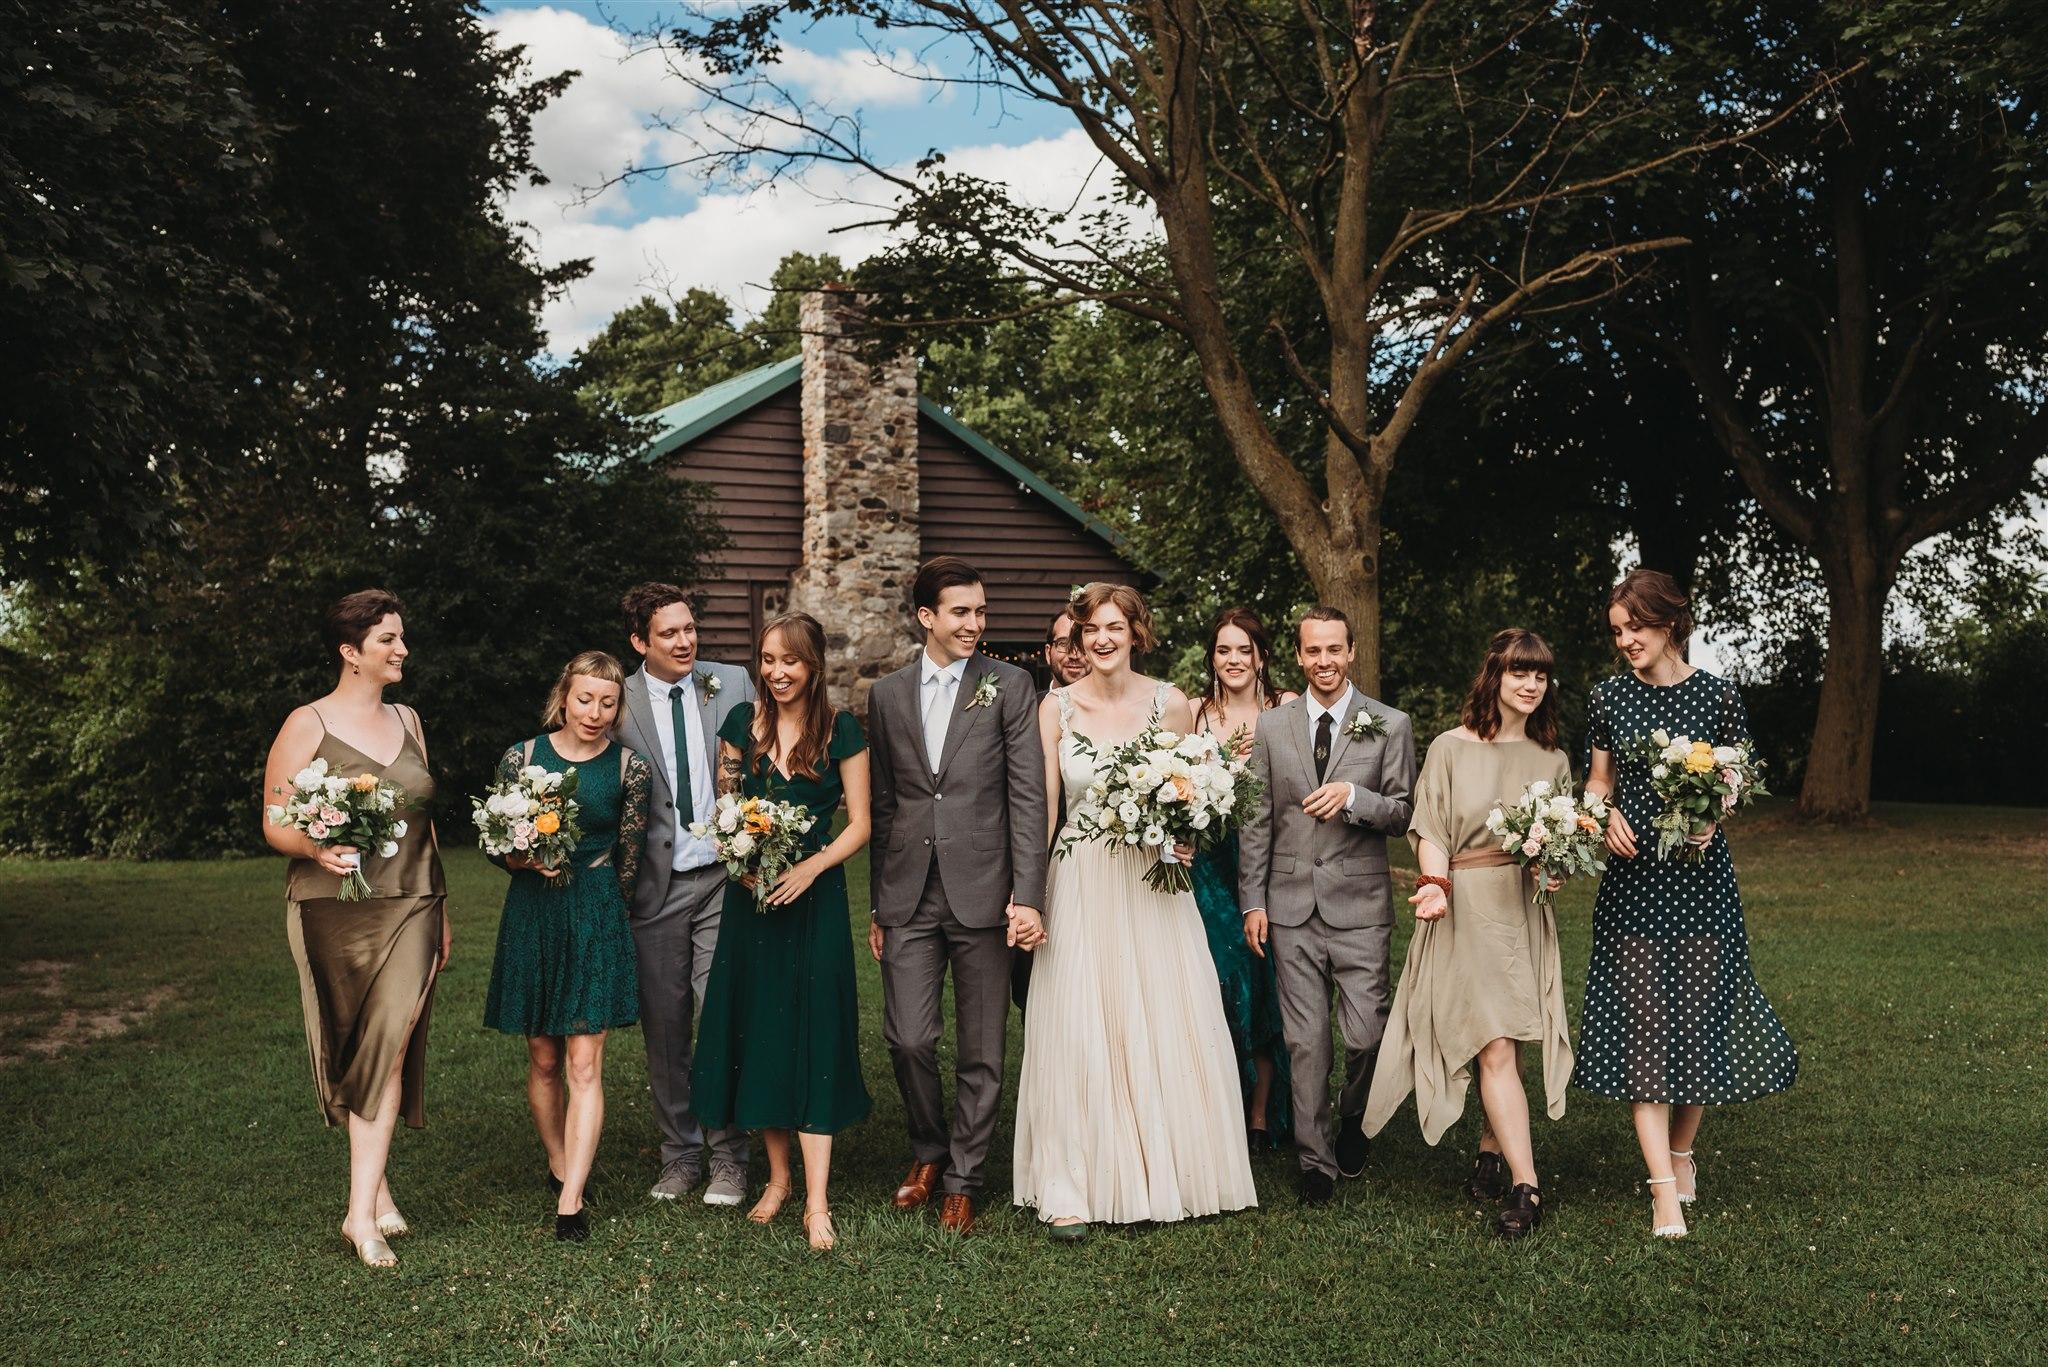 fanshawe conservation area wedding photos 311 1 - Watson Porter Pavillion Wedding